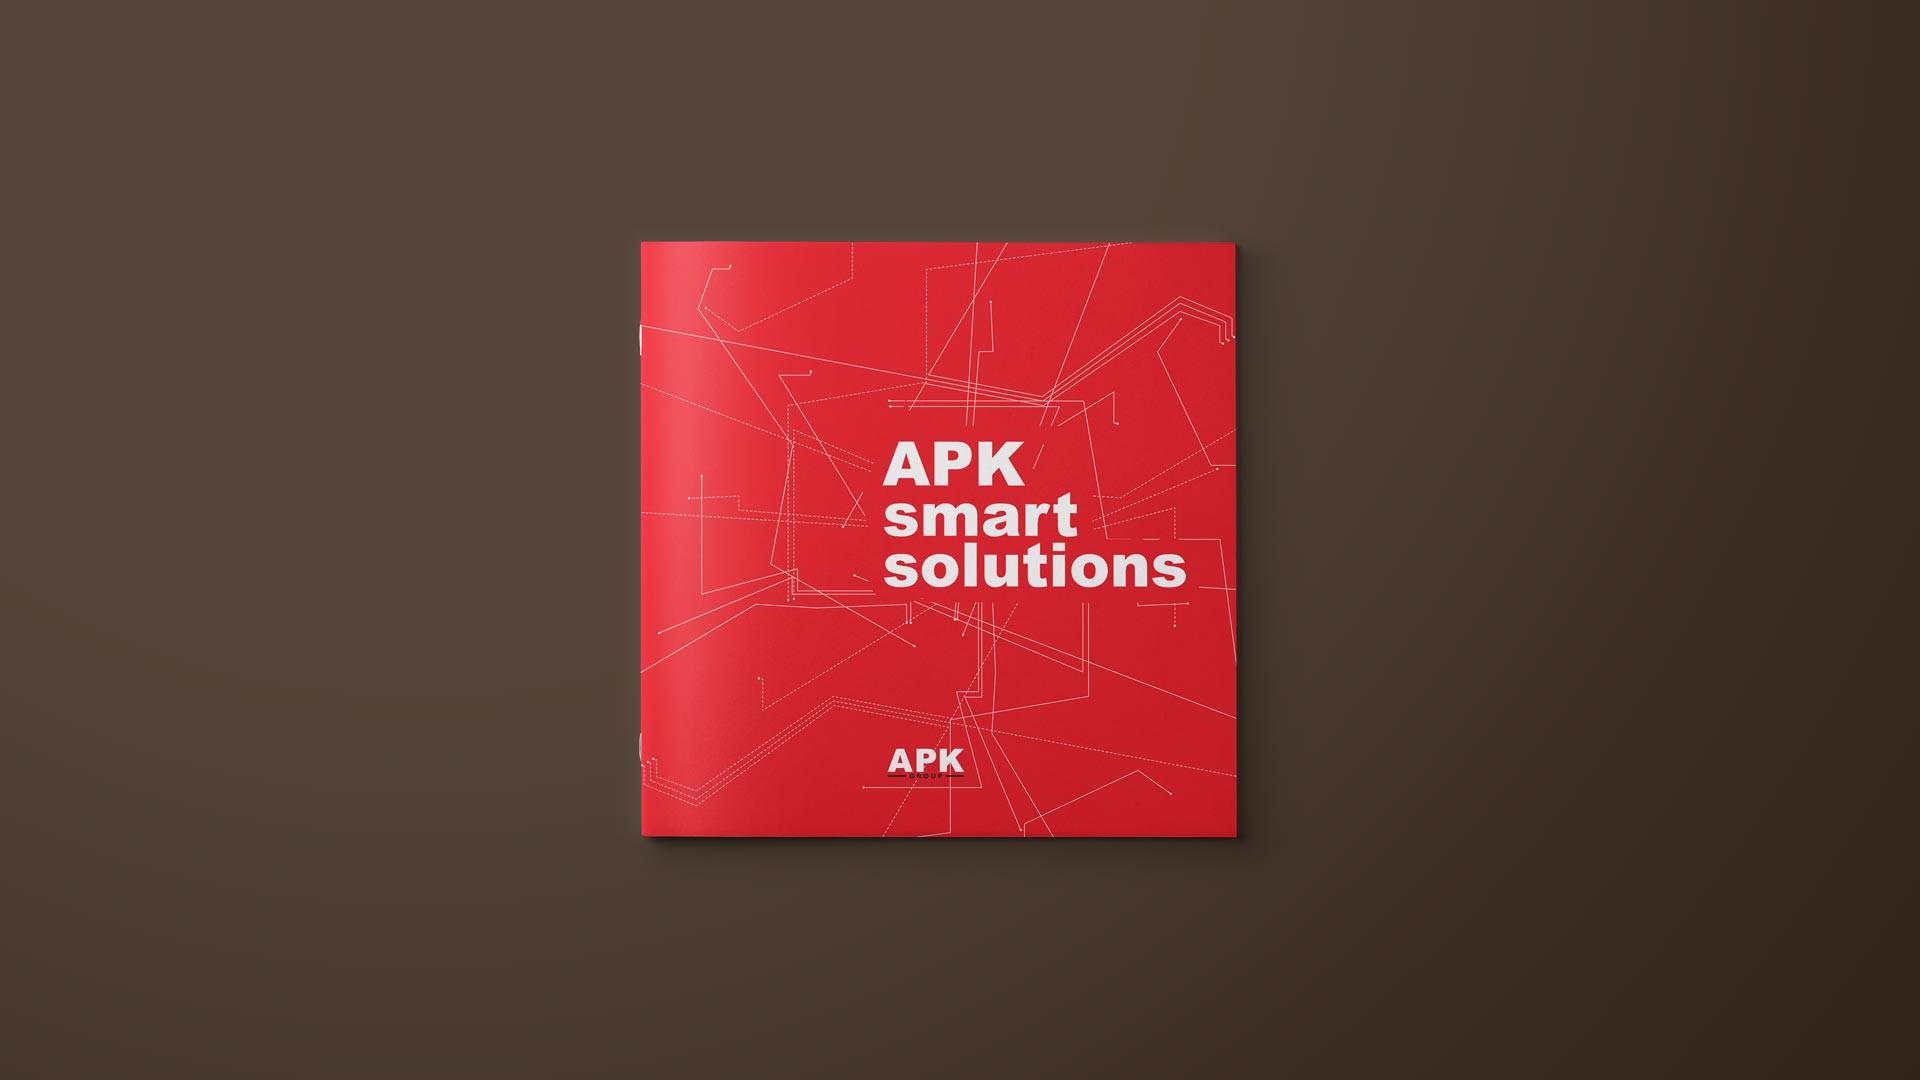 APK-Smart-Solutions-01.jpg